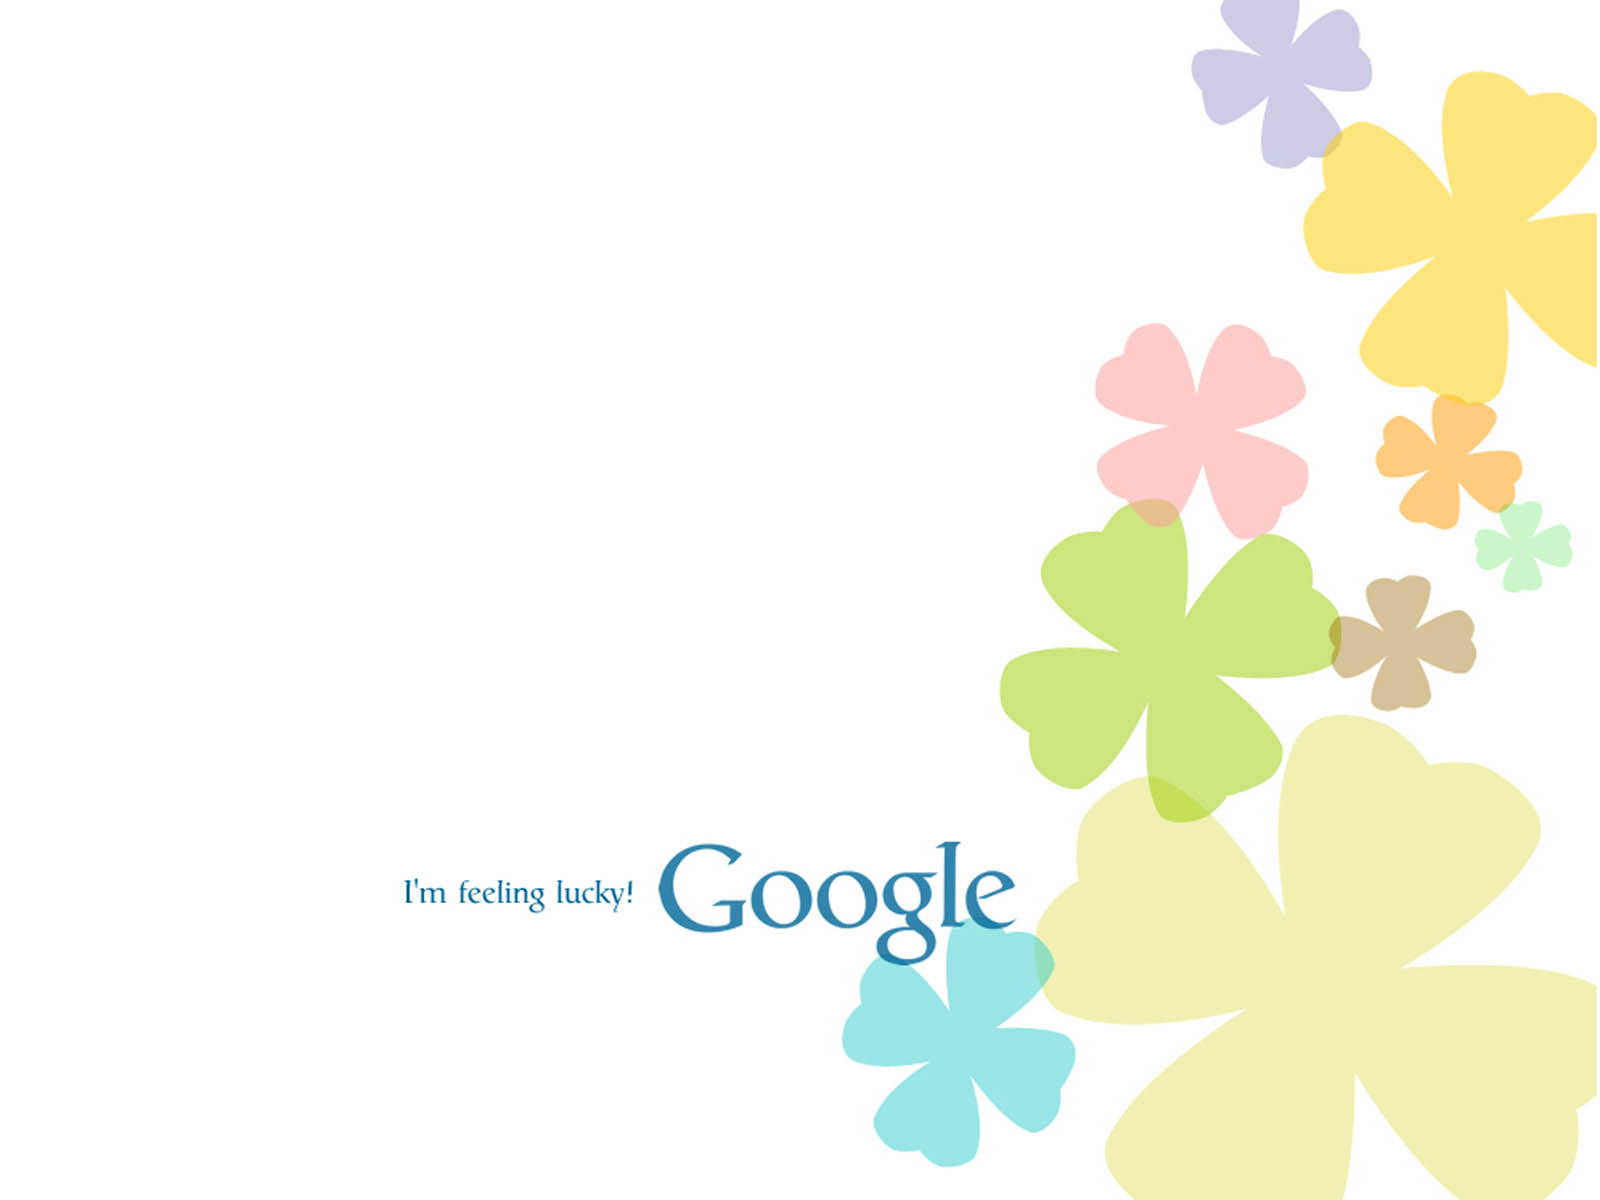 Google Desktop Backgrounds - WallpaperSafari